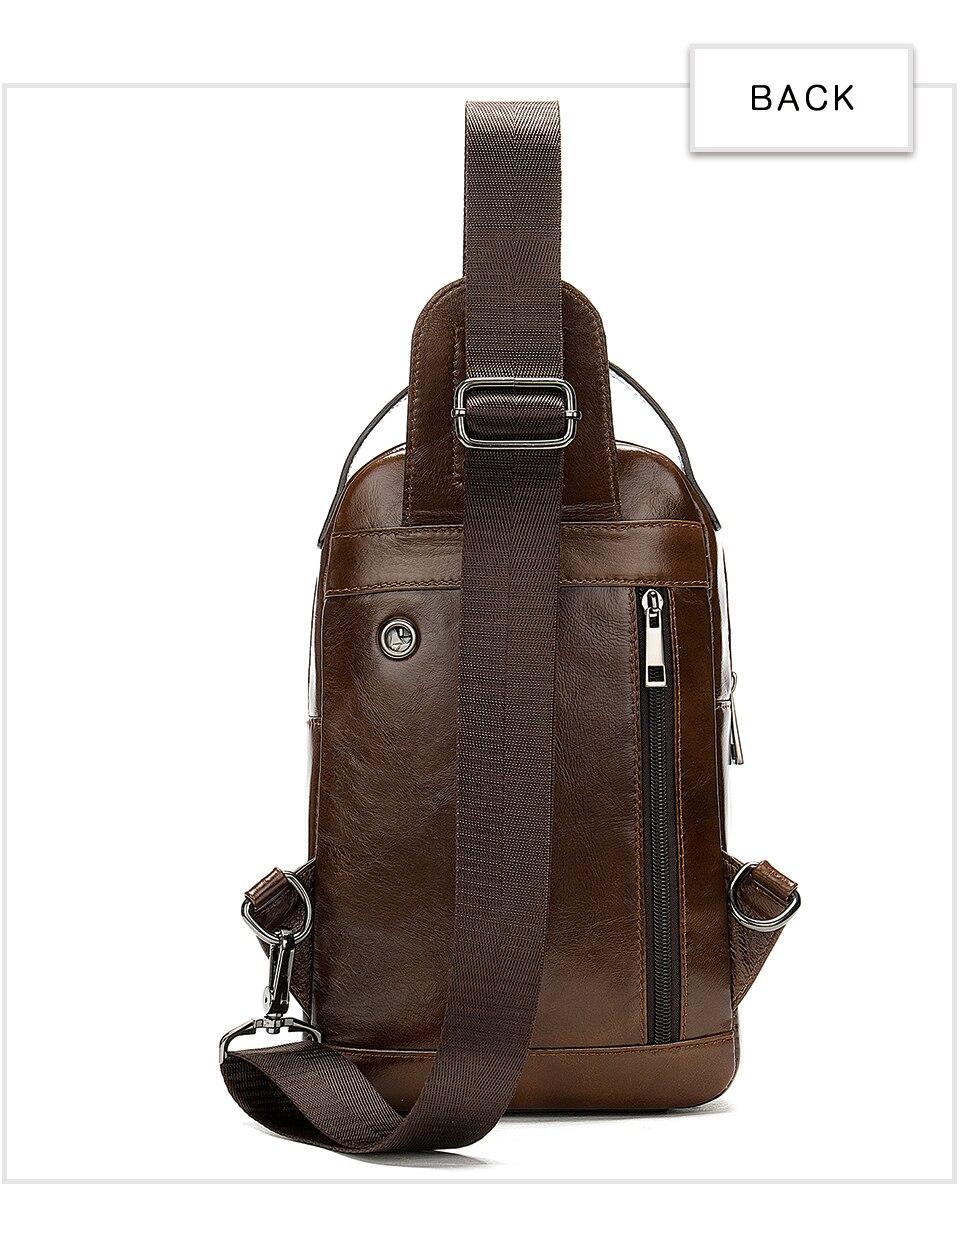 14 Men's Bag Leather Sling Bag Caual Men's Shoulder Bag Vintage Crossbody Bags for Men with Headphone Hole Travel Chest Pack